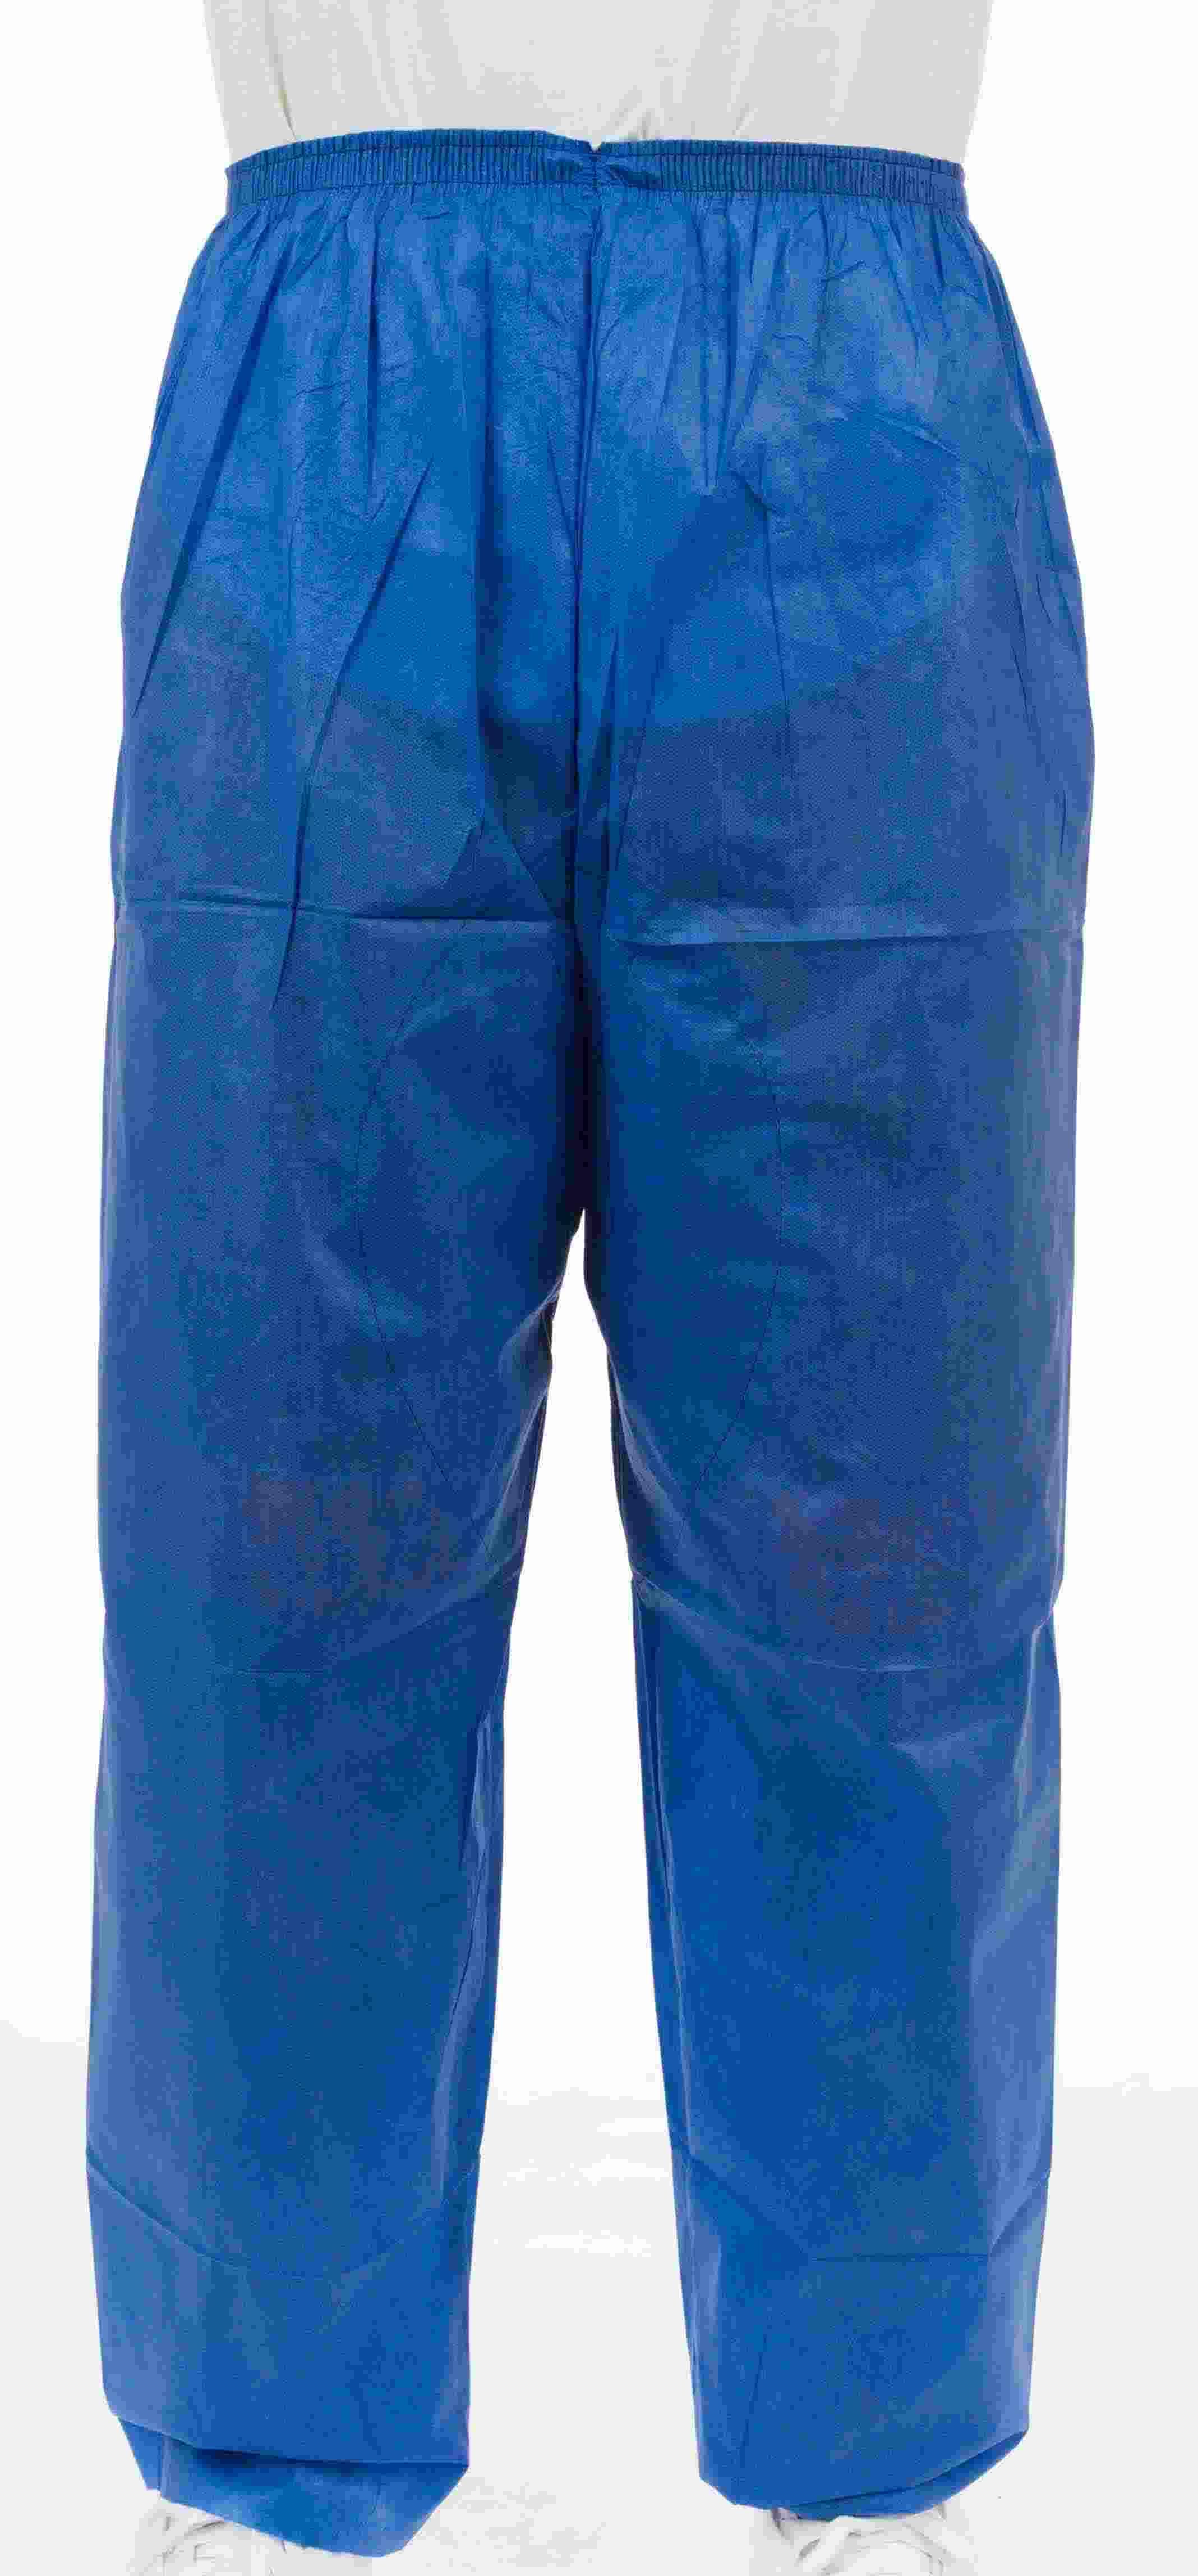 910f7a3b7c9 Enviroguard Soft Scrubs FS2062B Denim Blue Soft Scrub Pants with Wide  Elastic Waist   PalmFlex